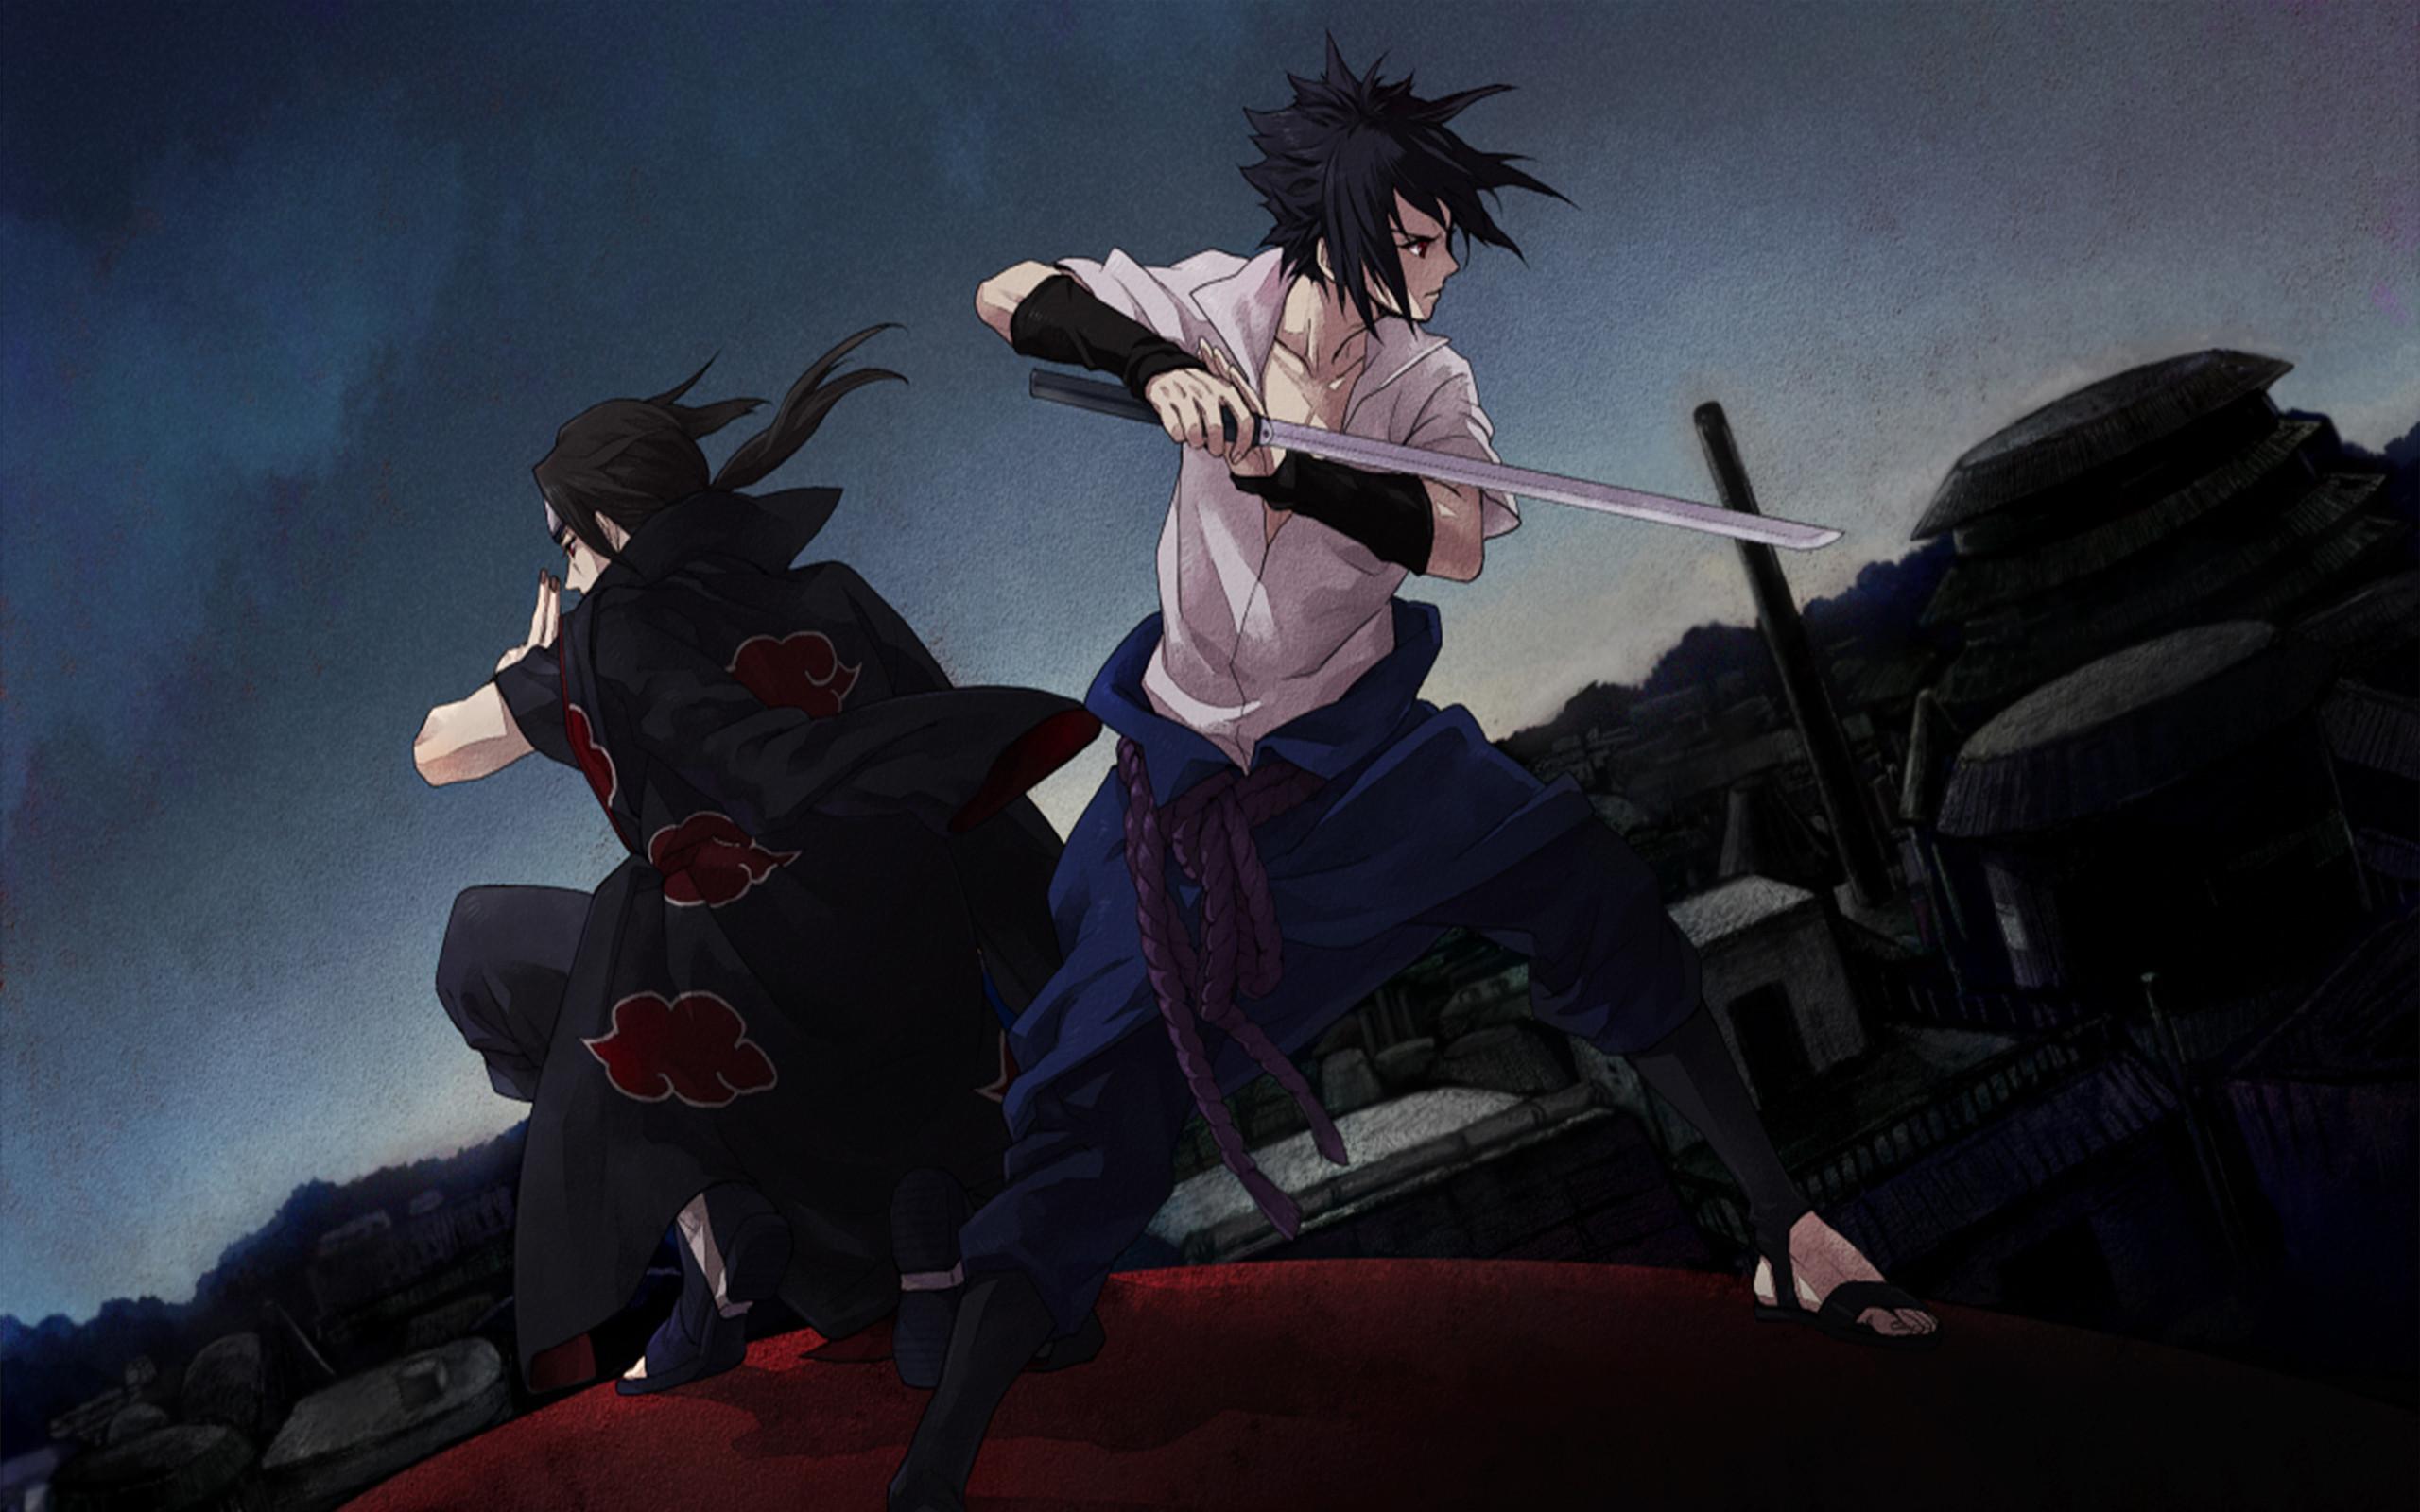 Uchiha Brothers Sasuke And Itachi Wallpaper Hd 81559 Hd Wallpaper Backgrounds Download